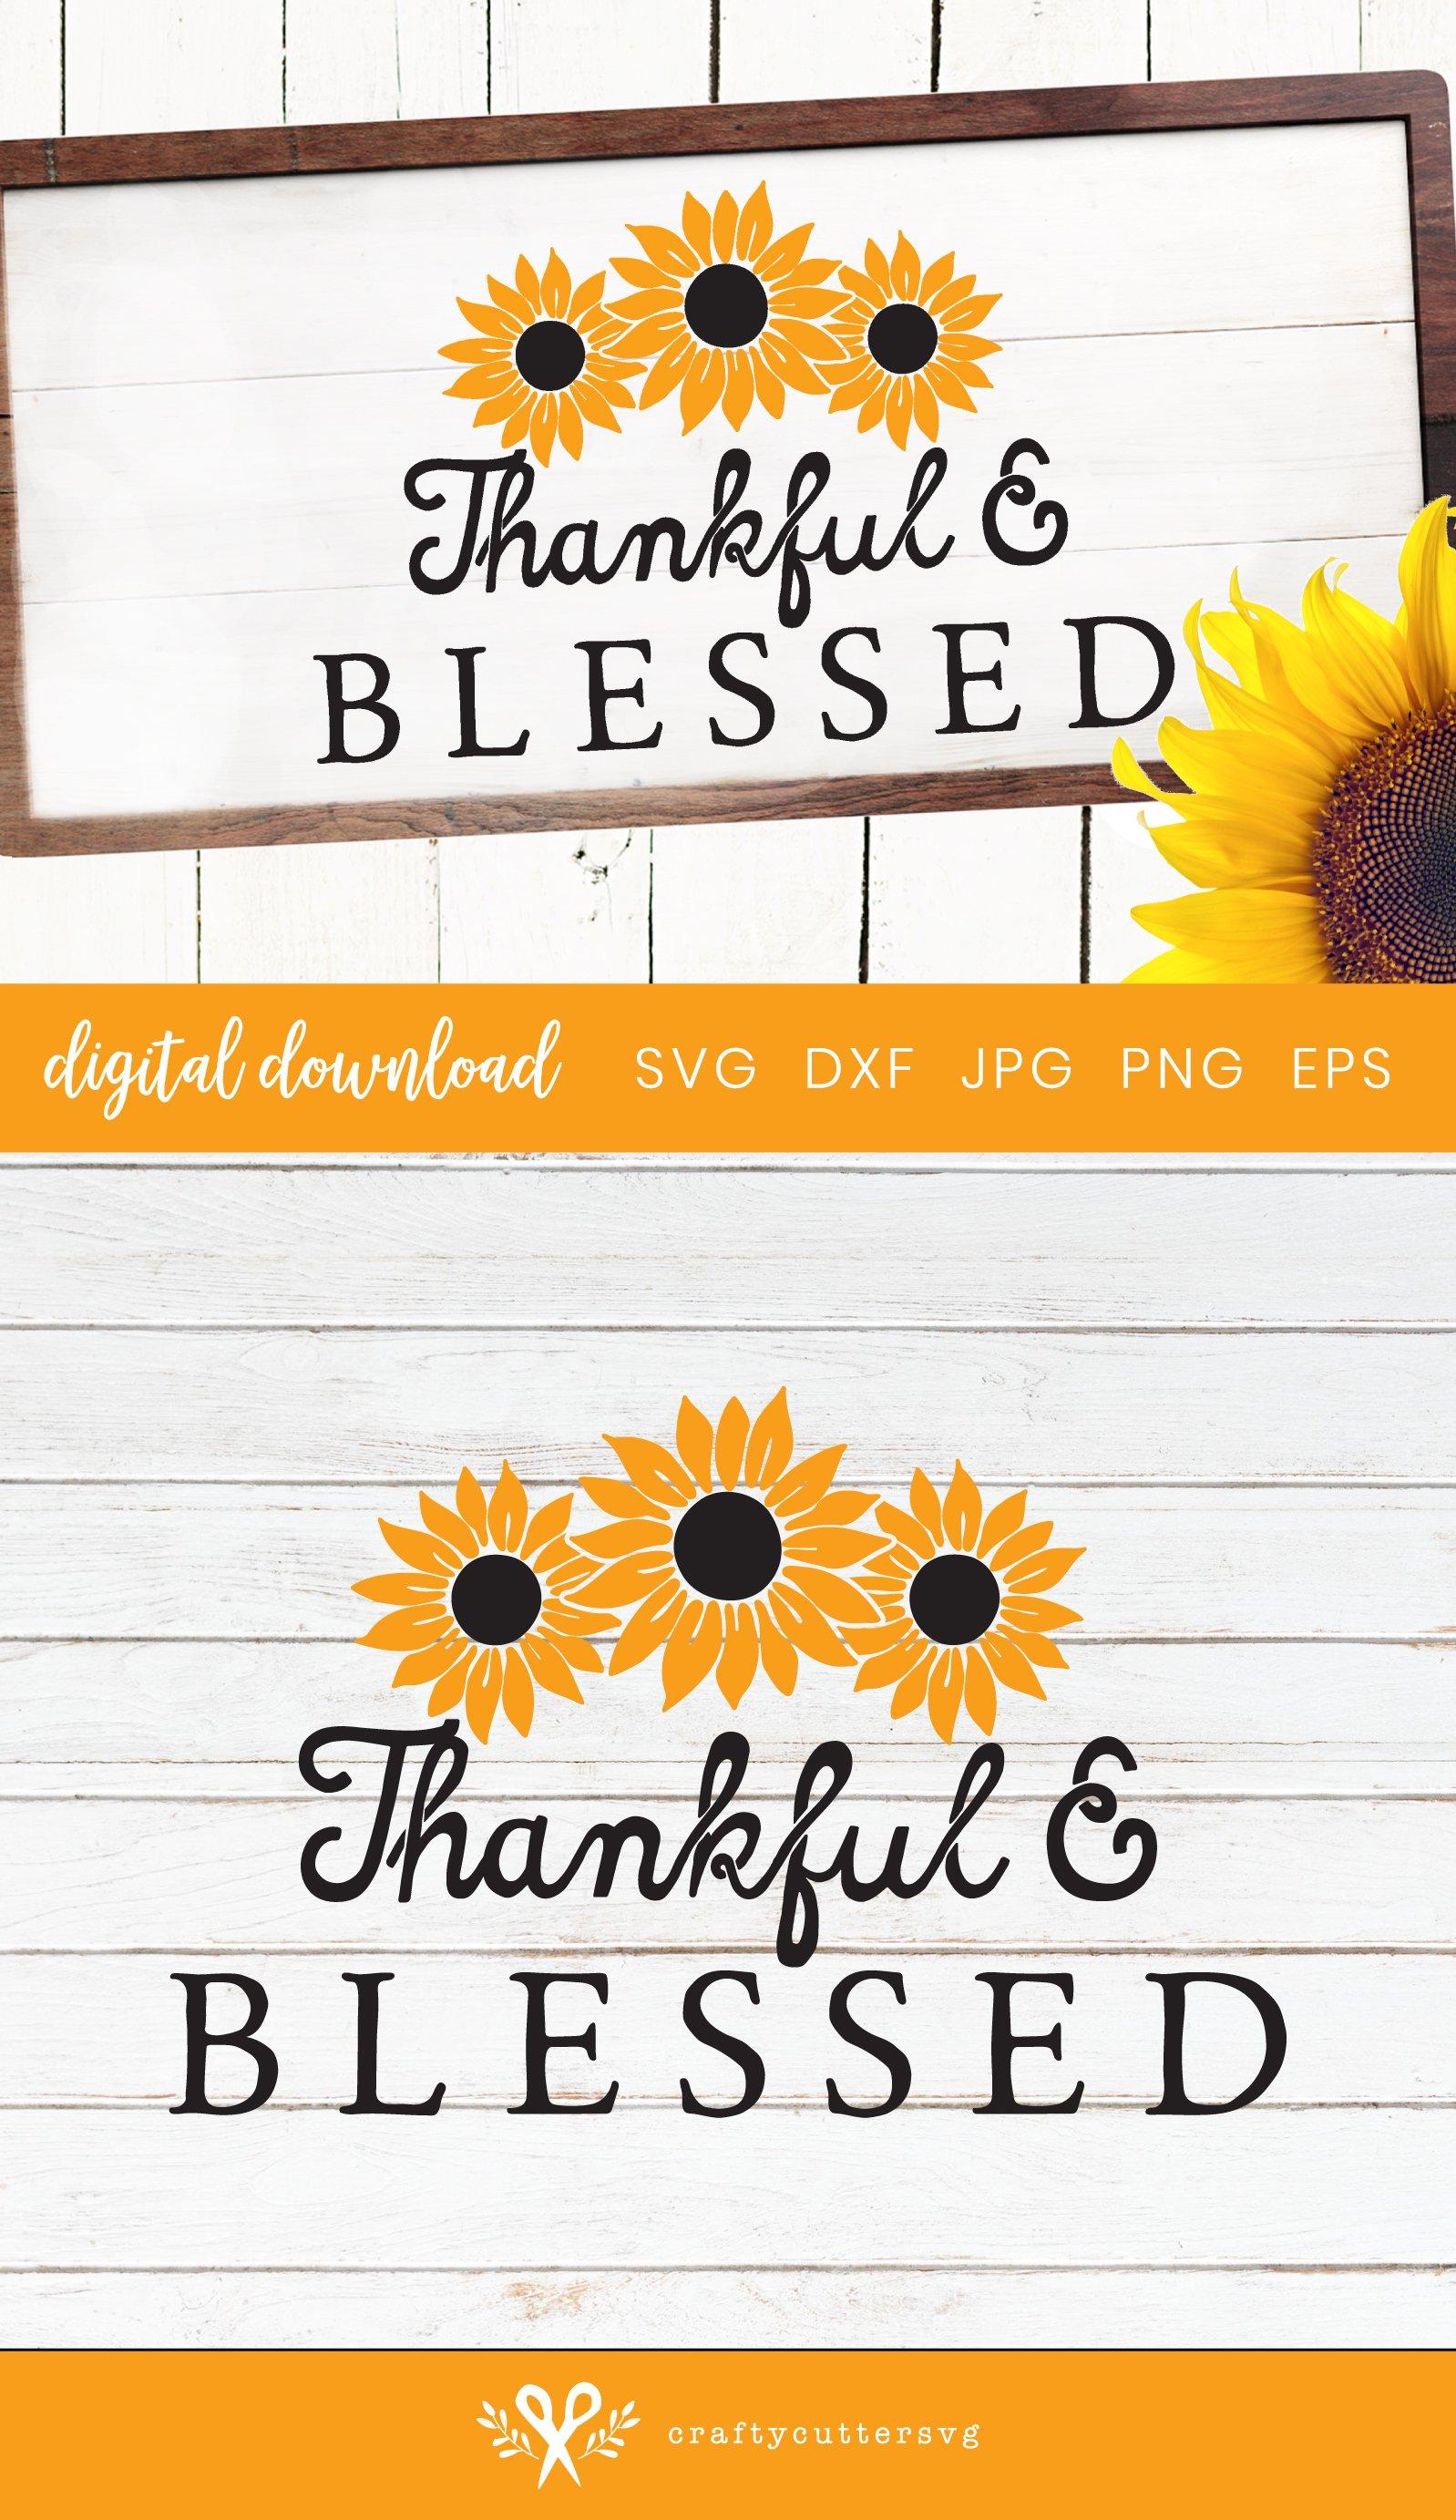 Sunflower Svg | Sunflower Farmhouse Sign Cut File example image 3